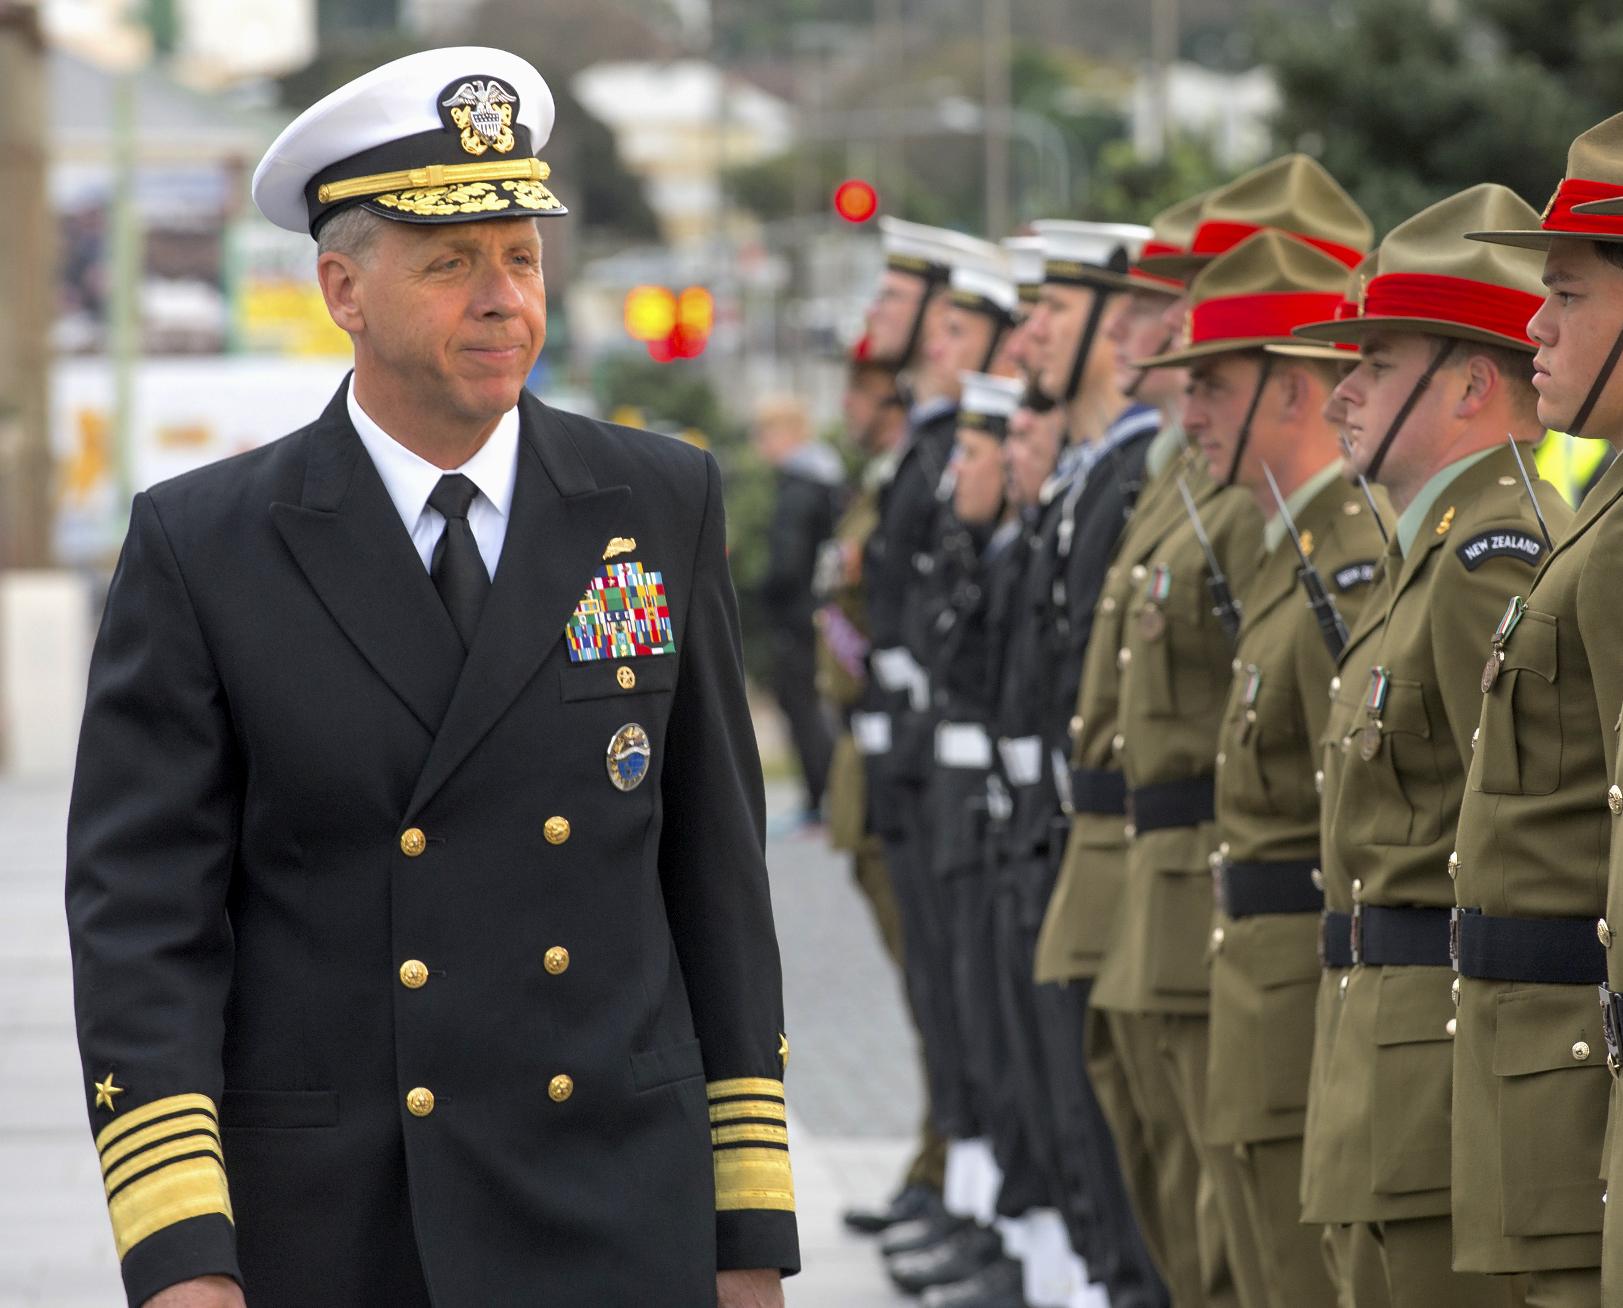 Pacific Commander Davidson Asks Congress to Fund 'Regain the Advantage' Plan Aimed at China